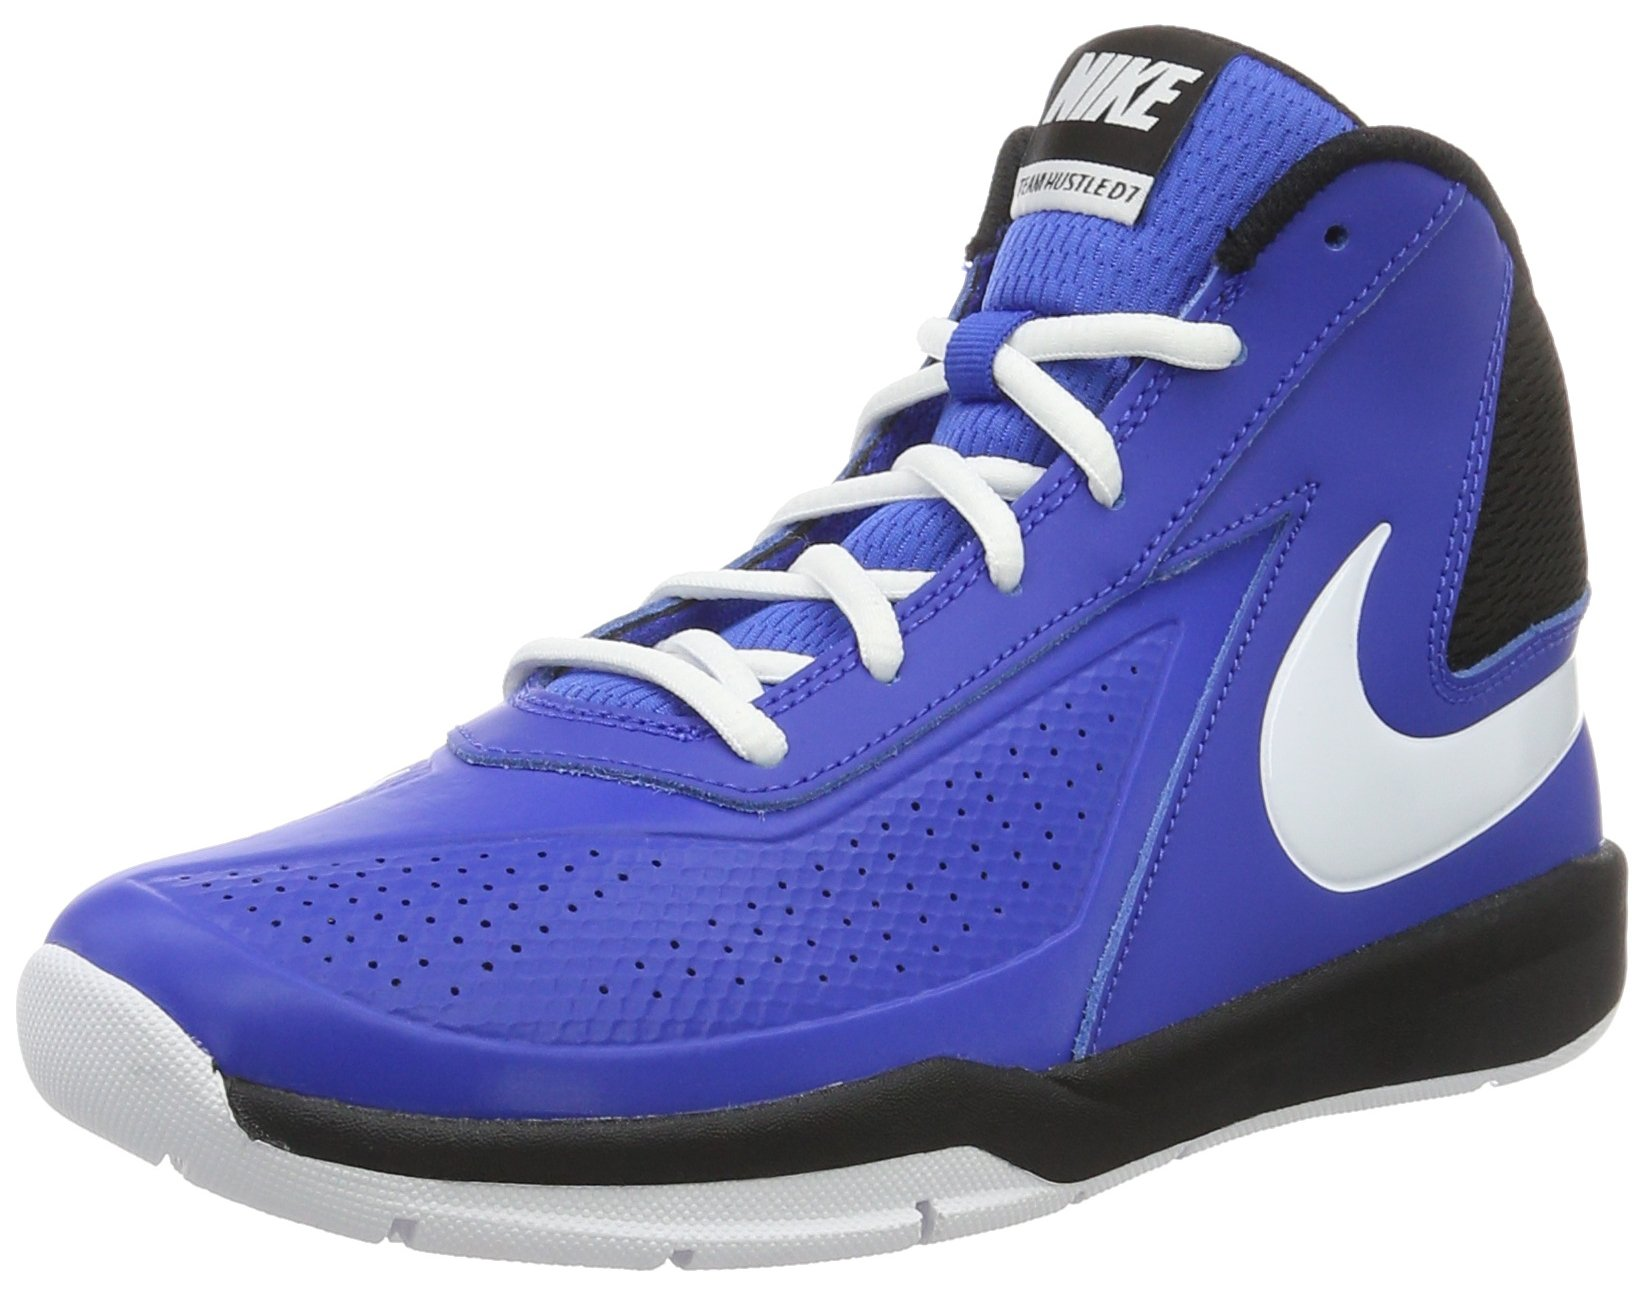 c389492439d5 Galleon - Nike Boy s Team Hustle D 7 Basketball Shoe Game Royal White Black  Size 6 M US